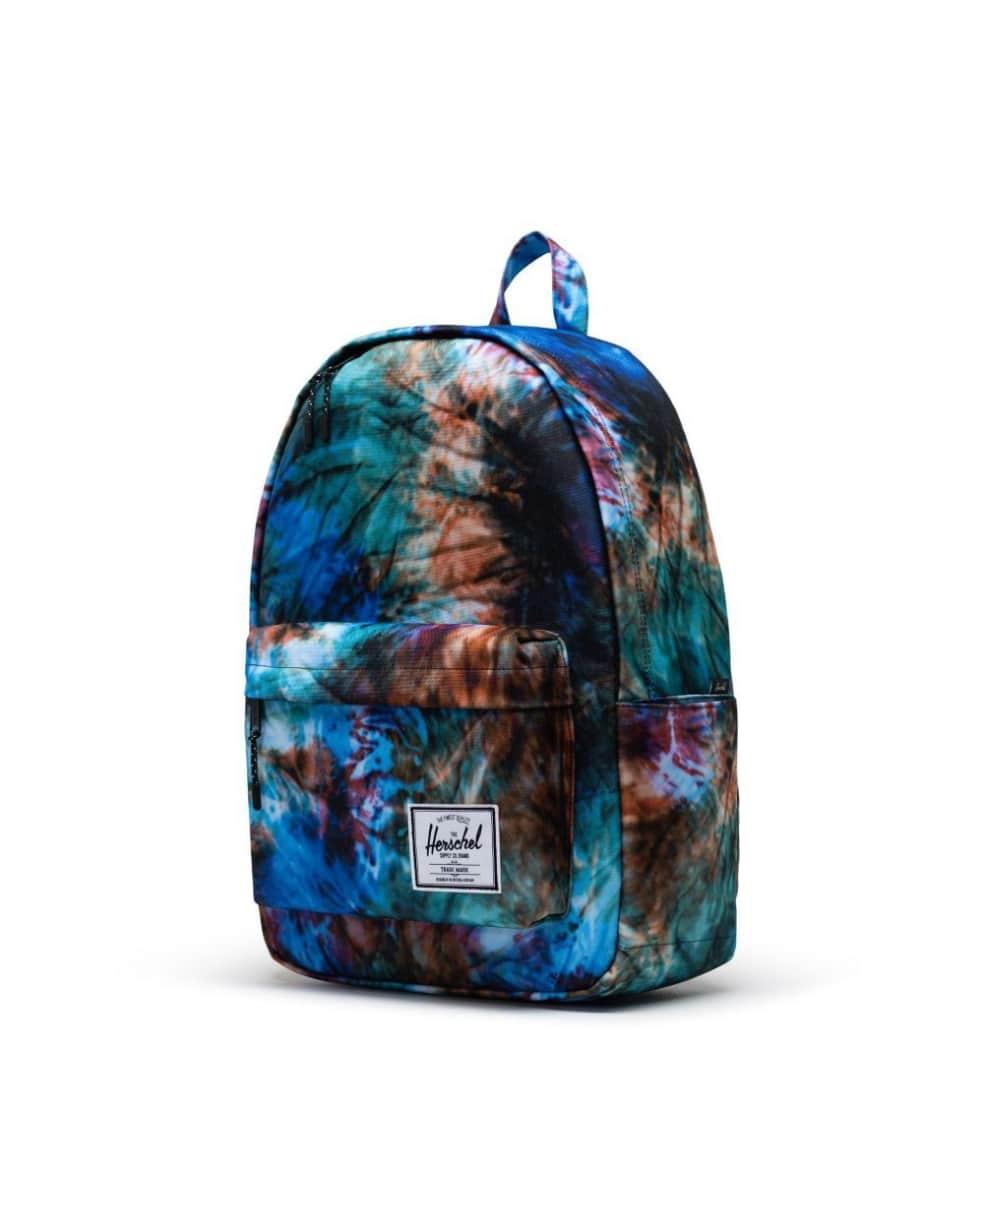 Herschel Classic XL Backpack - Summer Tie Dye   Backpack by Herschel Supply Co. 3